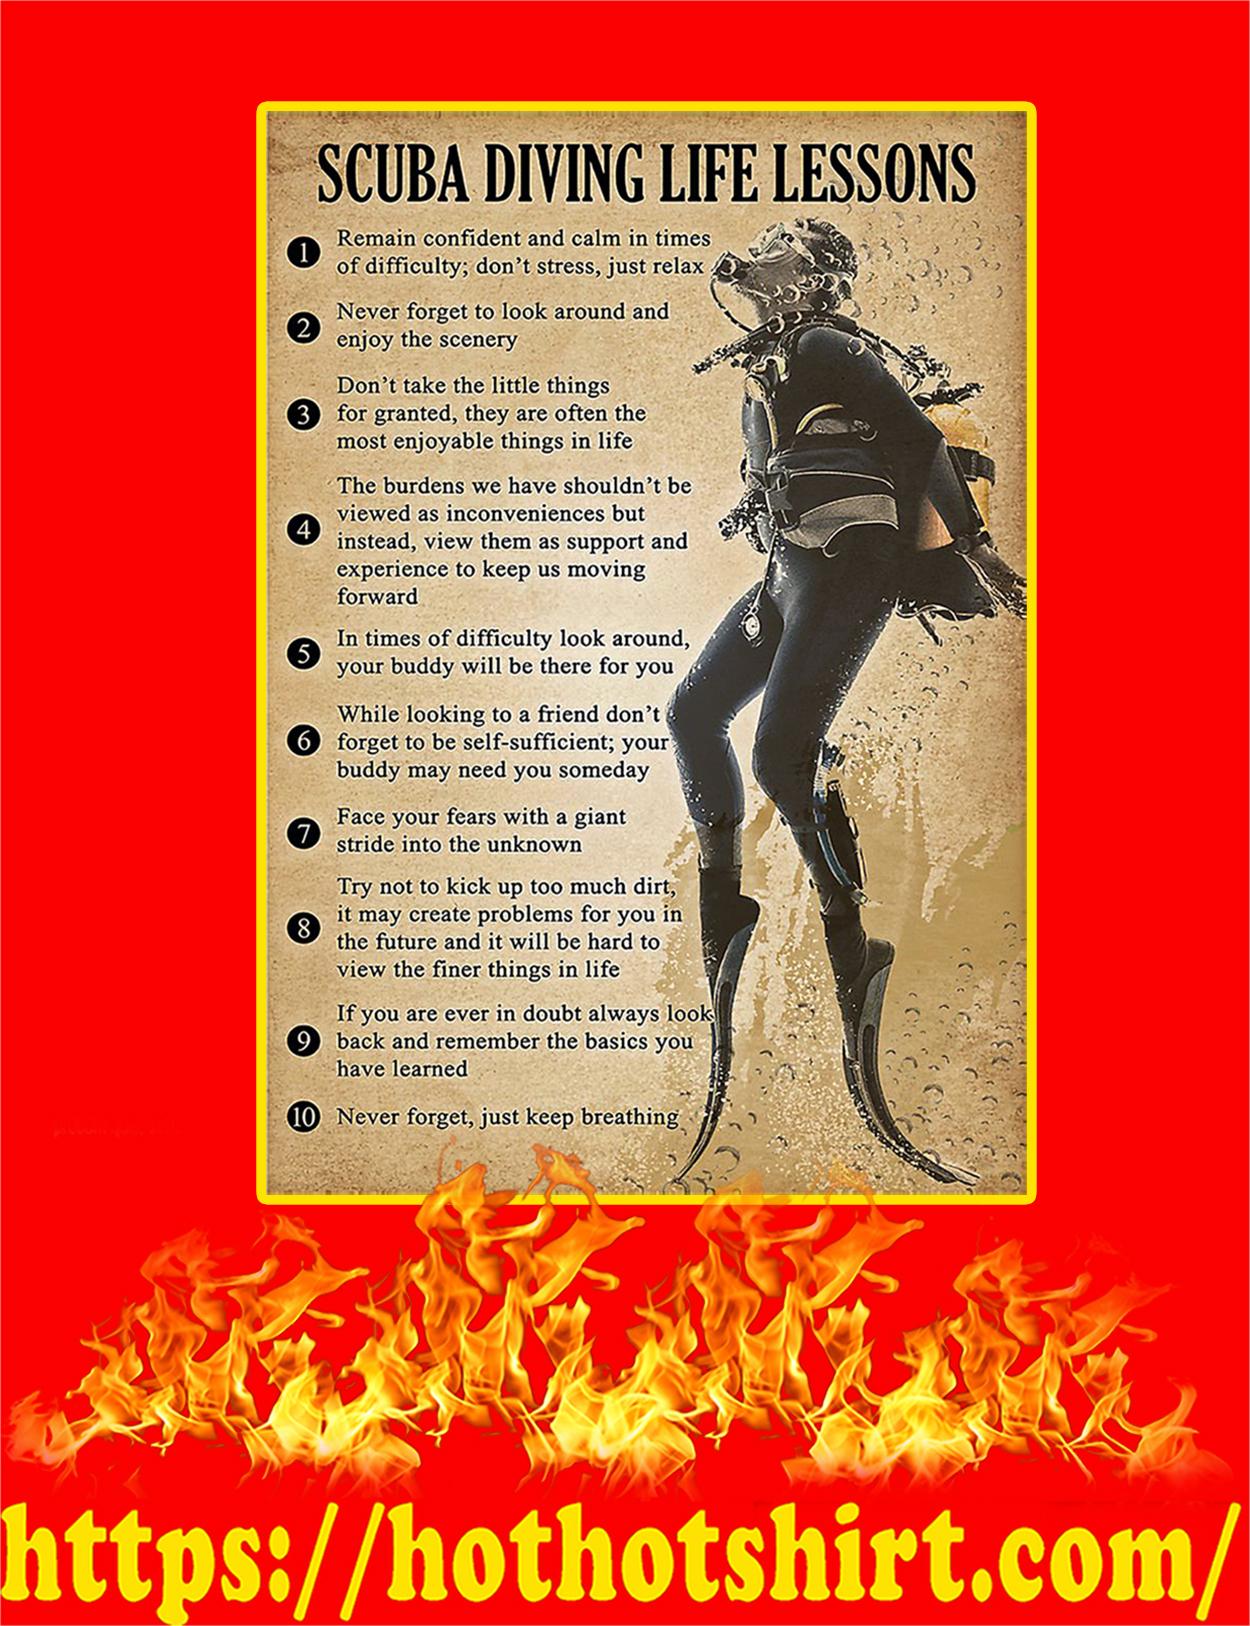 Scuba Diving Life Lessons Poster - A2